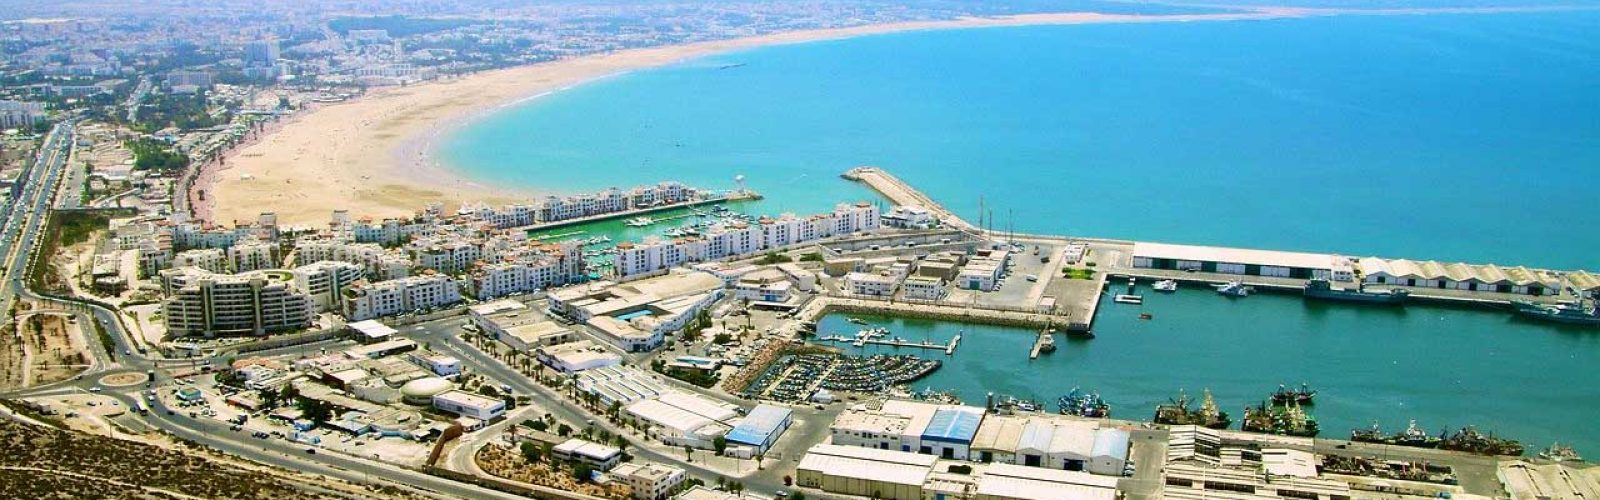 Tour Da Agadir Al Deserto (Erg Chebbi) 3 Giorni 2 notti